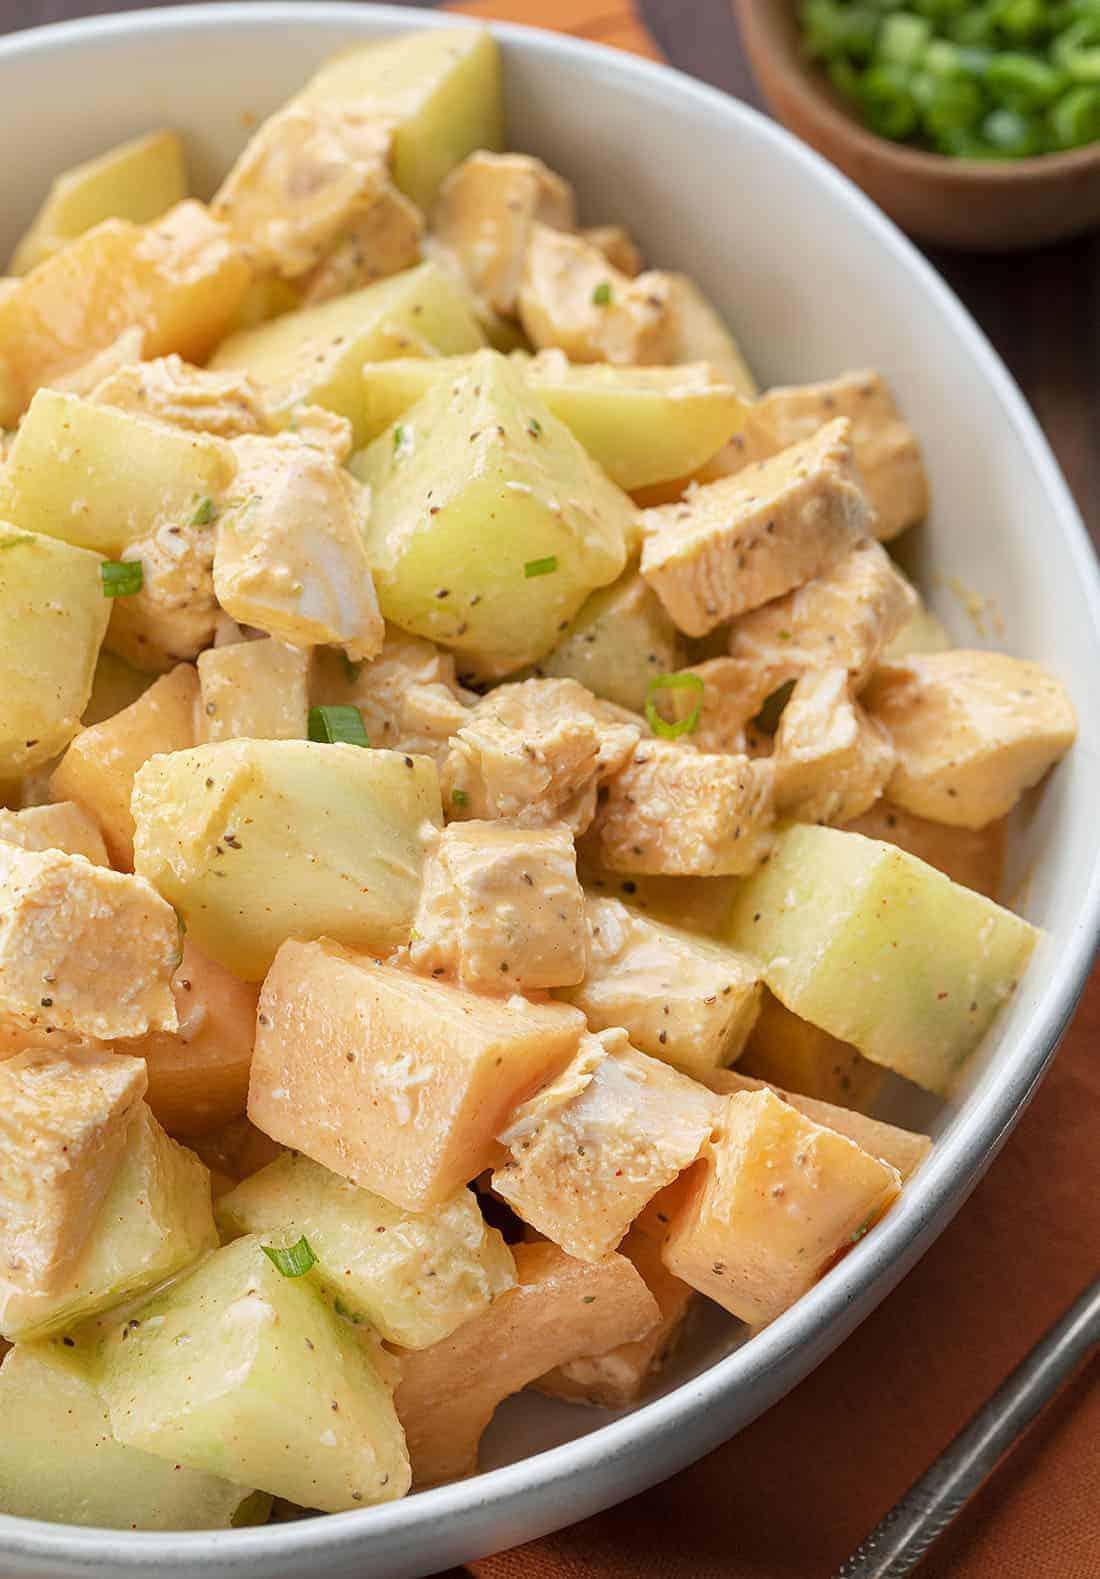 Bowl of Cantaloupe Honey Dew Salad - Melon Salad